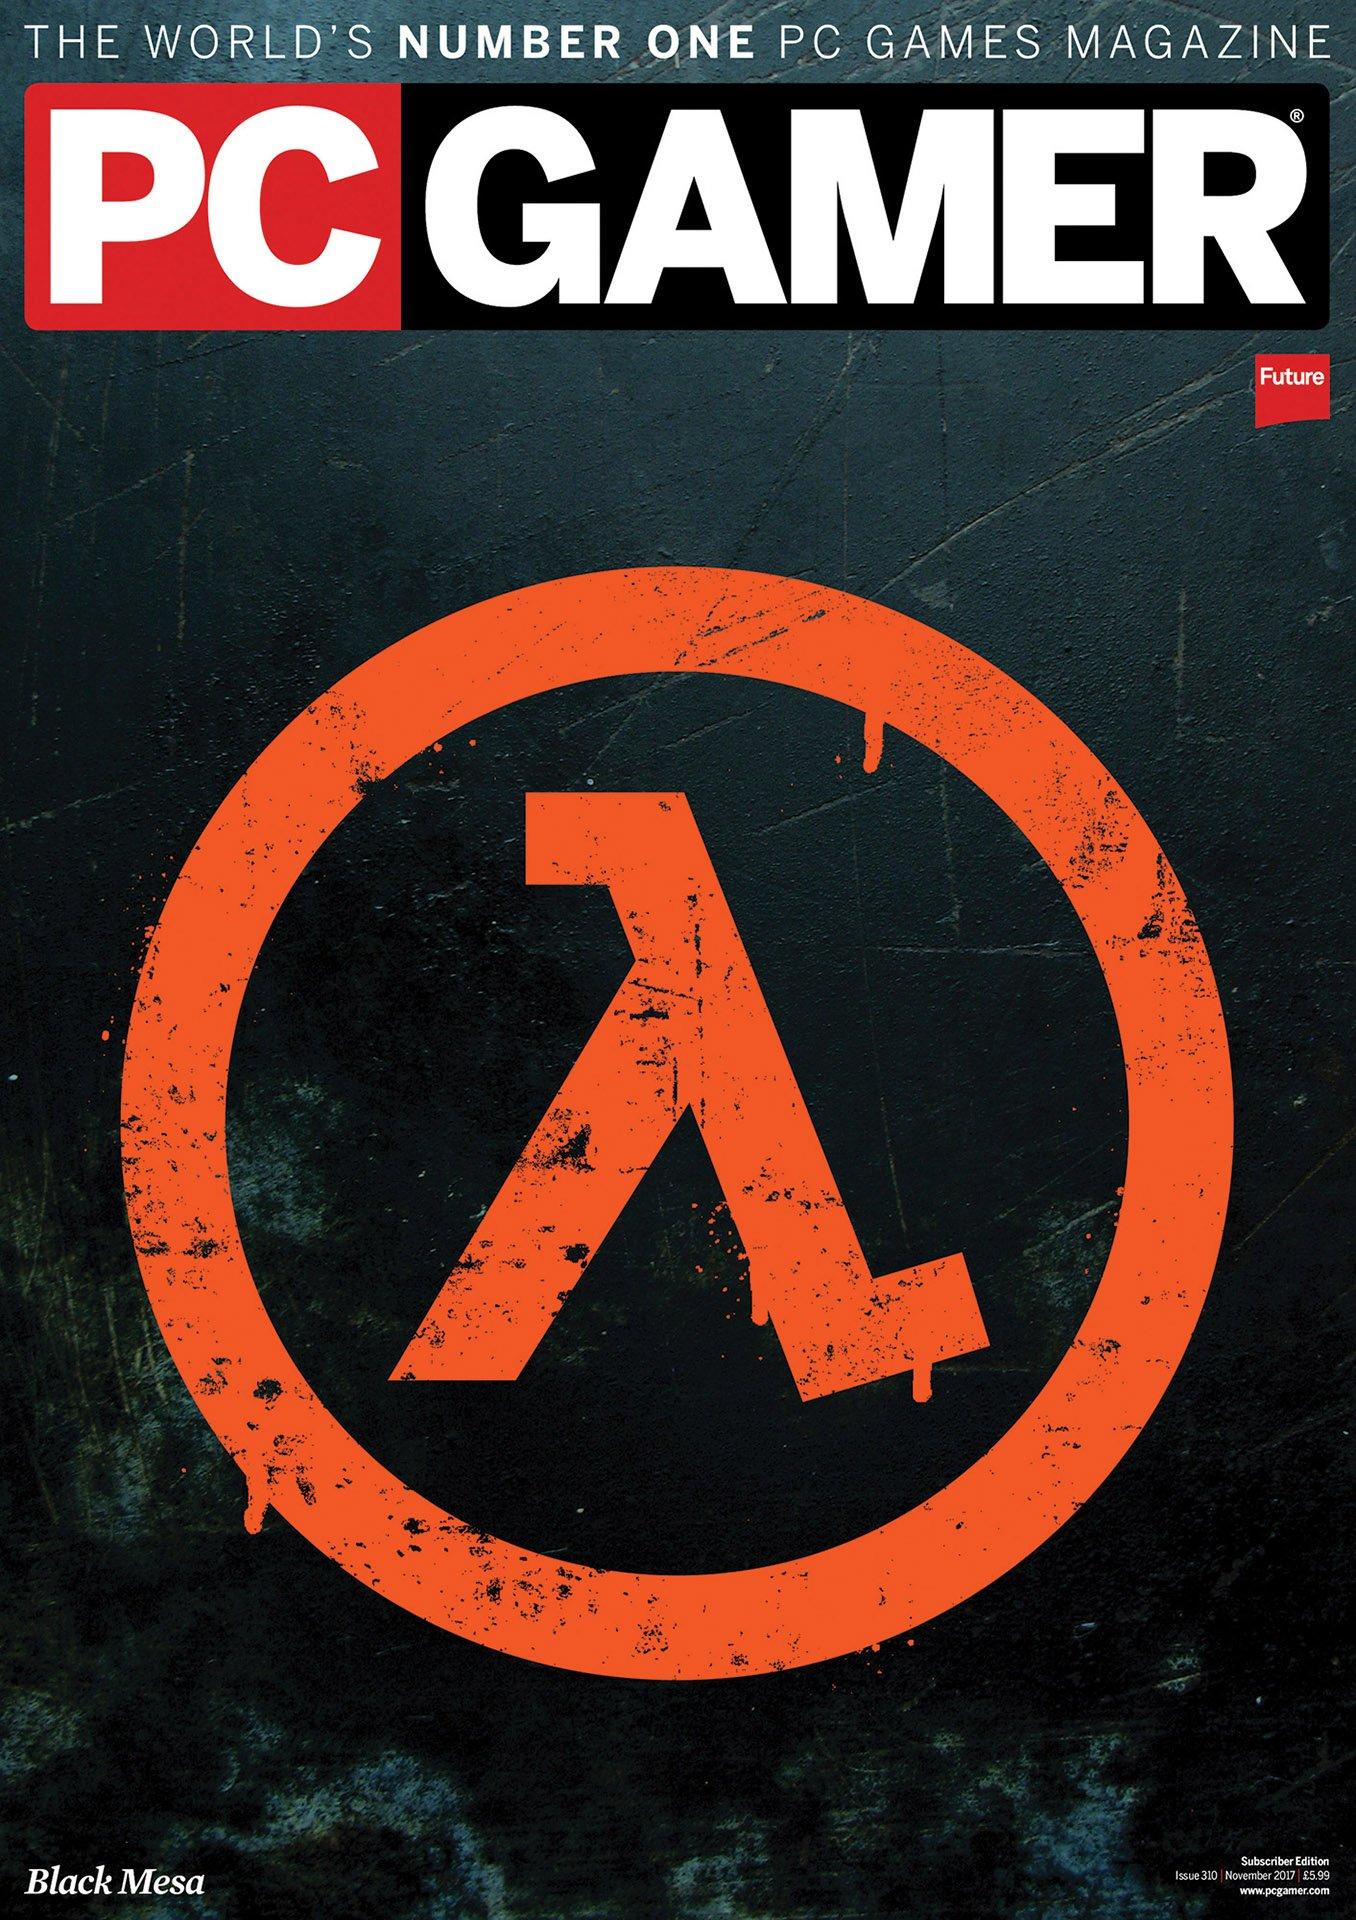 PC Gamer UK 310 November 2017 (subscriber edition)